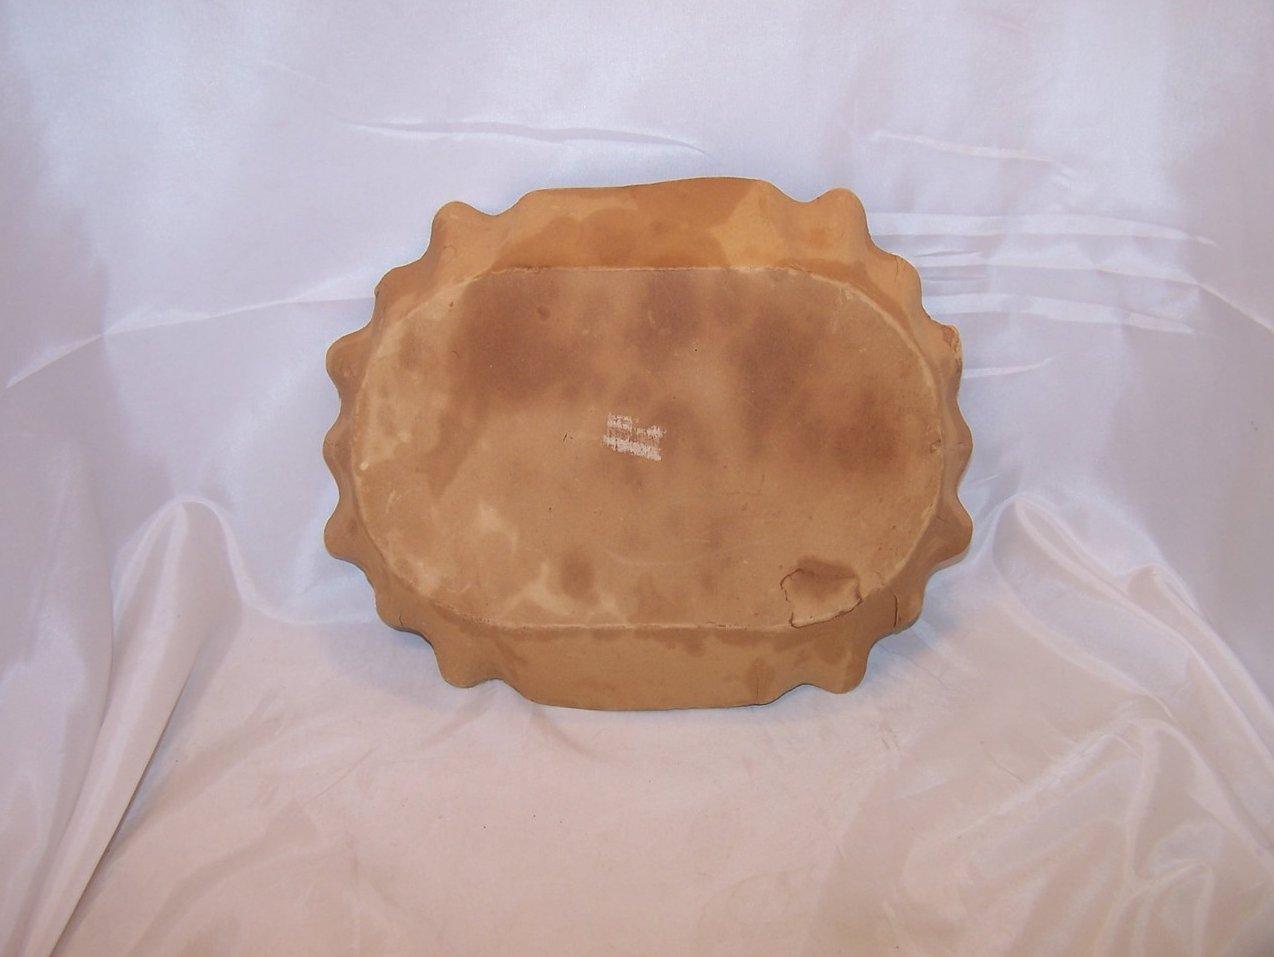 Image 1 of Snow White Paper Serving Bowl, Vintage German, Great Collectors Piece